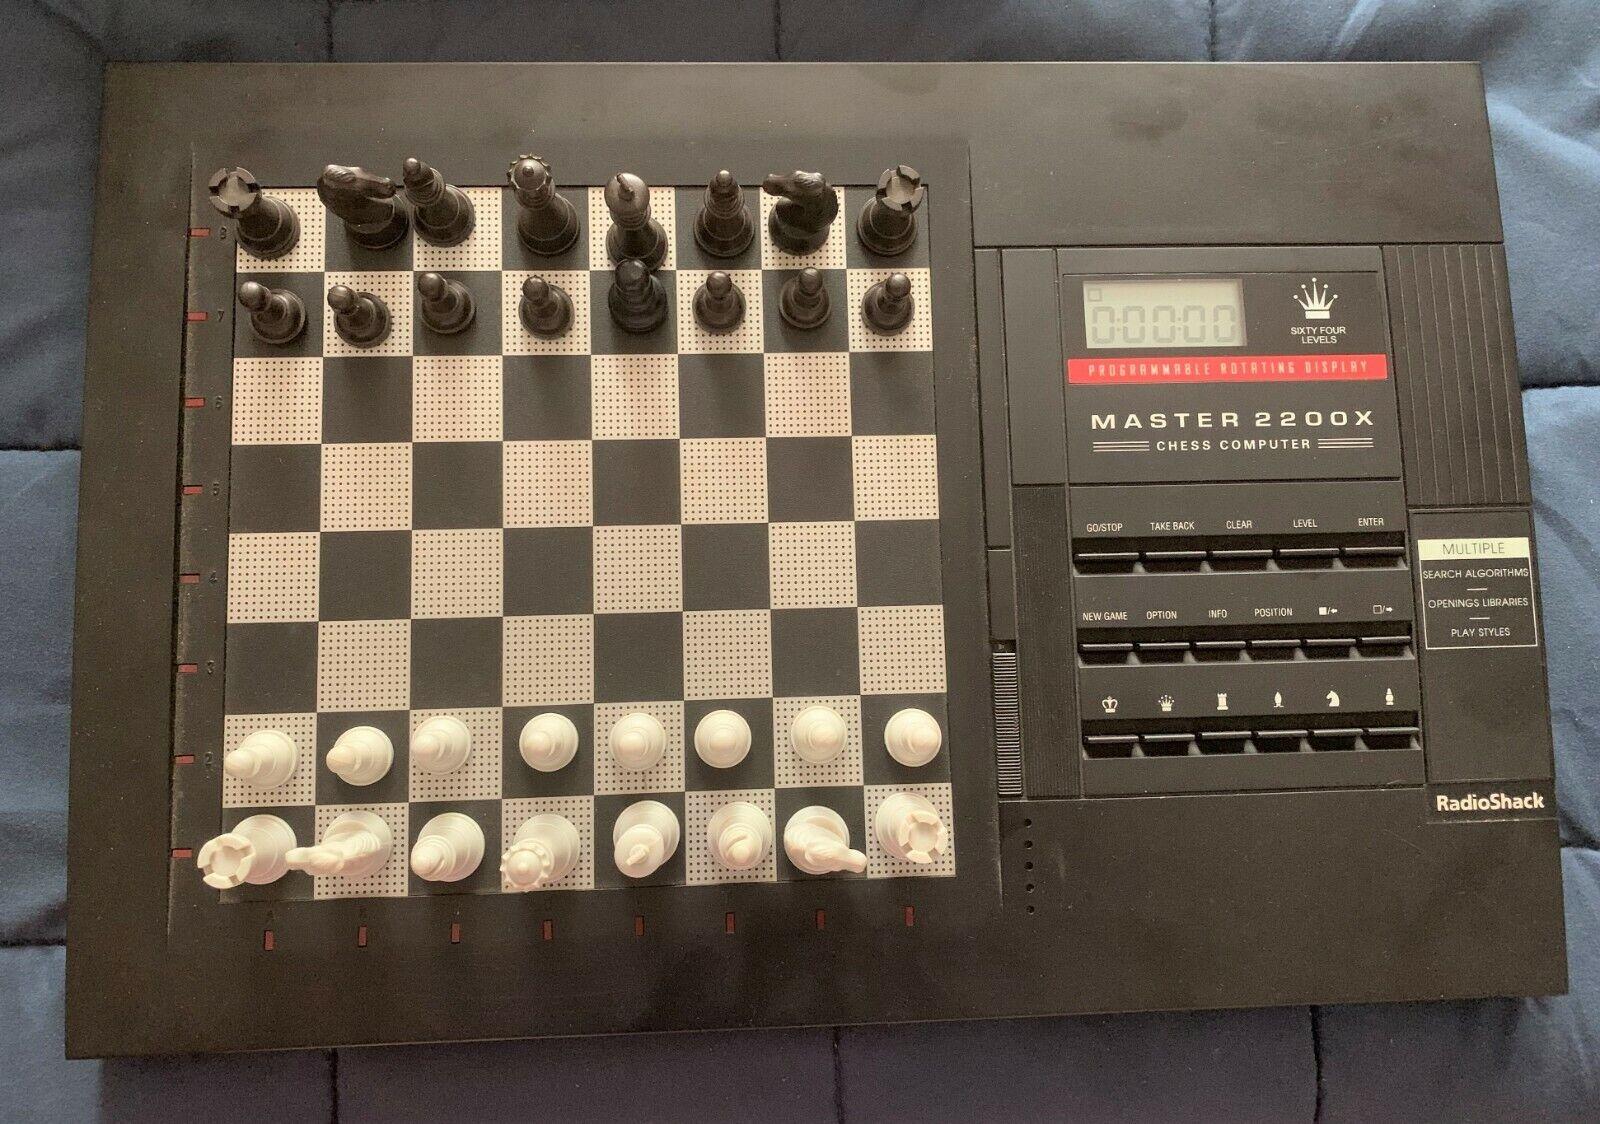 Computer Games - VINTAGE SENSORY CHESS COMPUTER Master 2200X - BOX